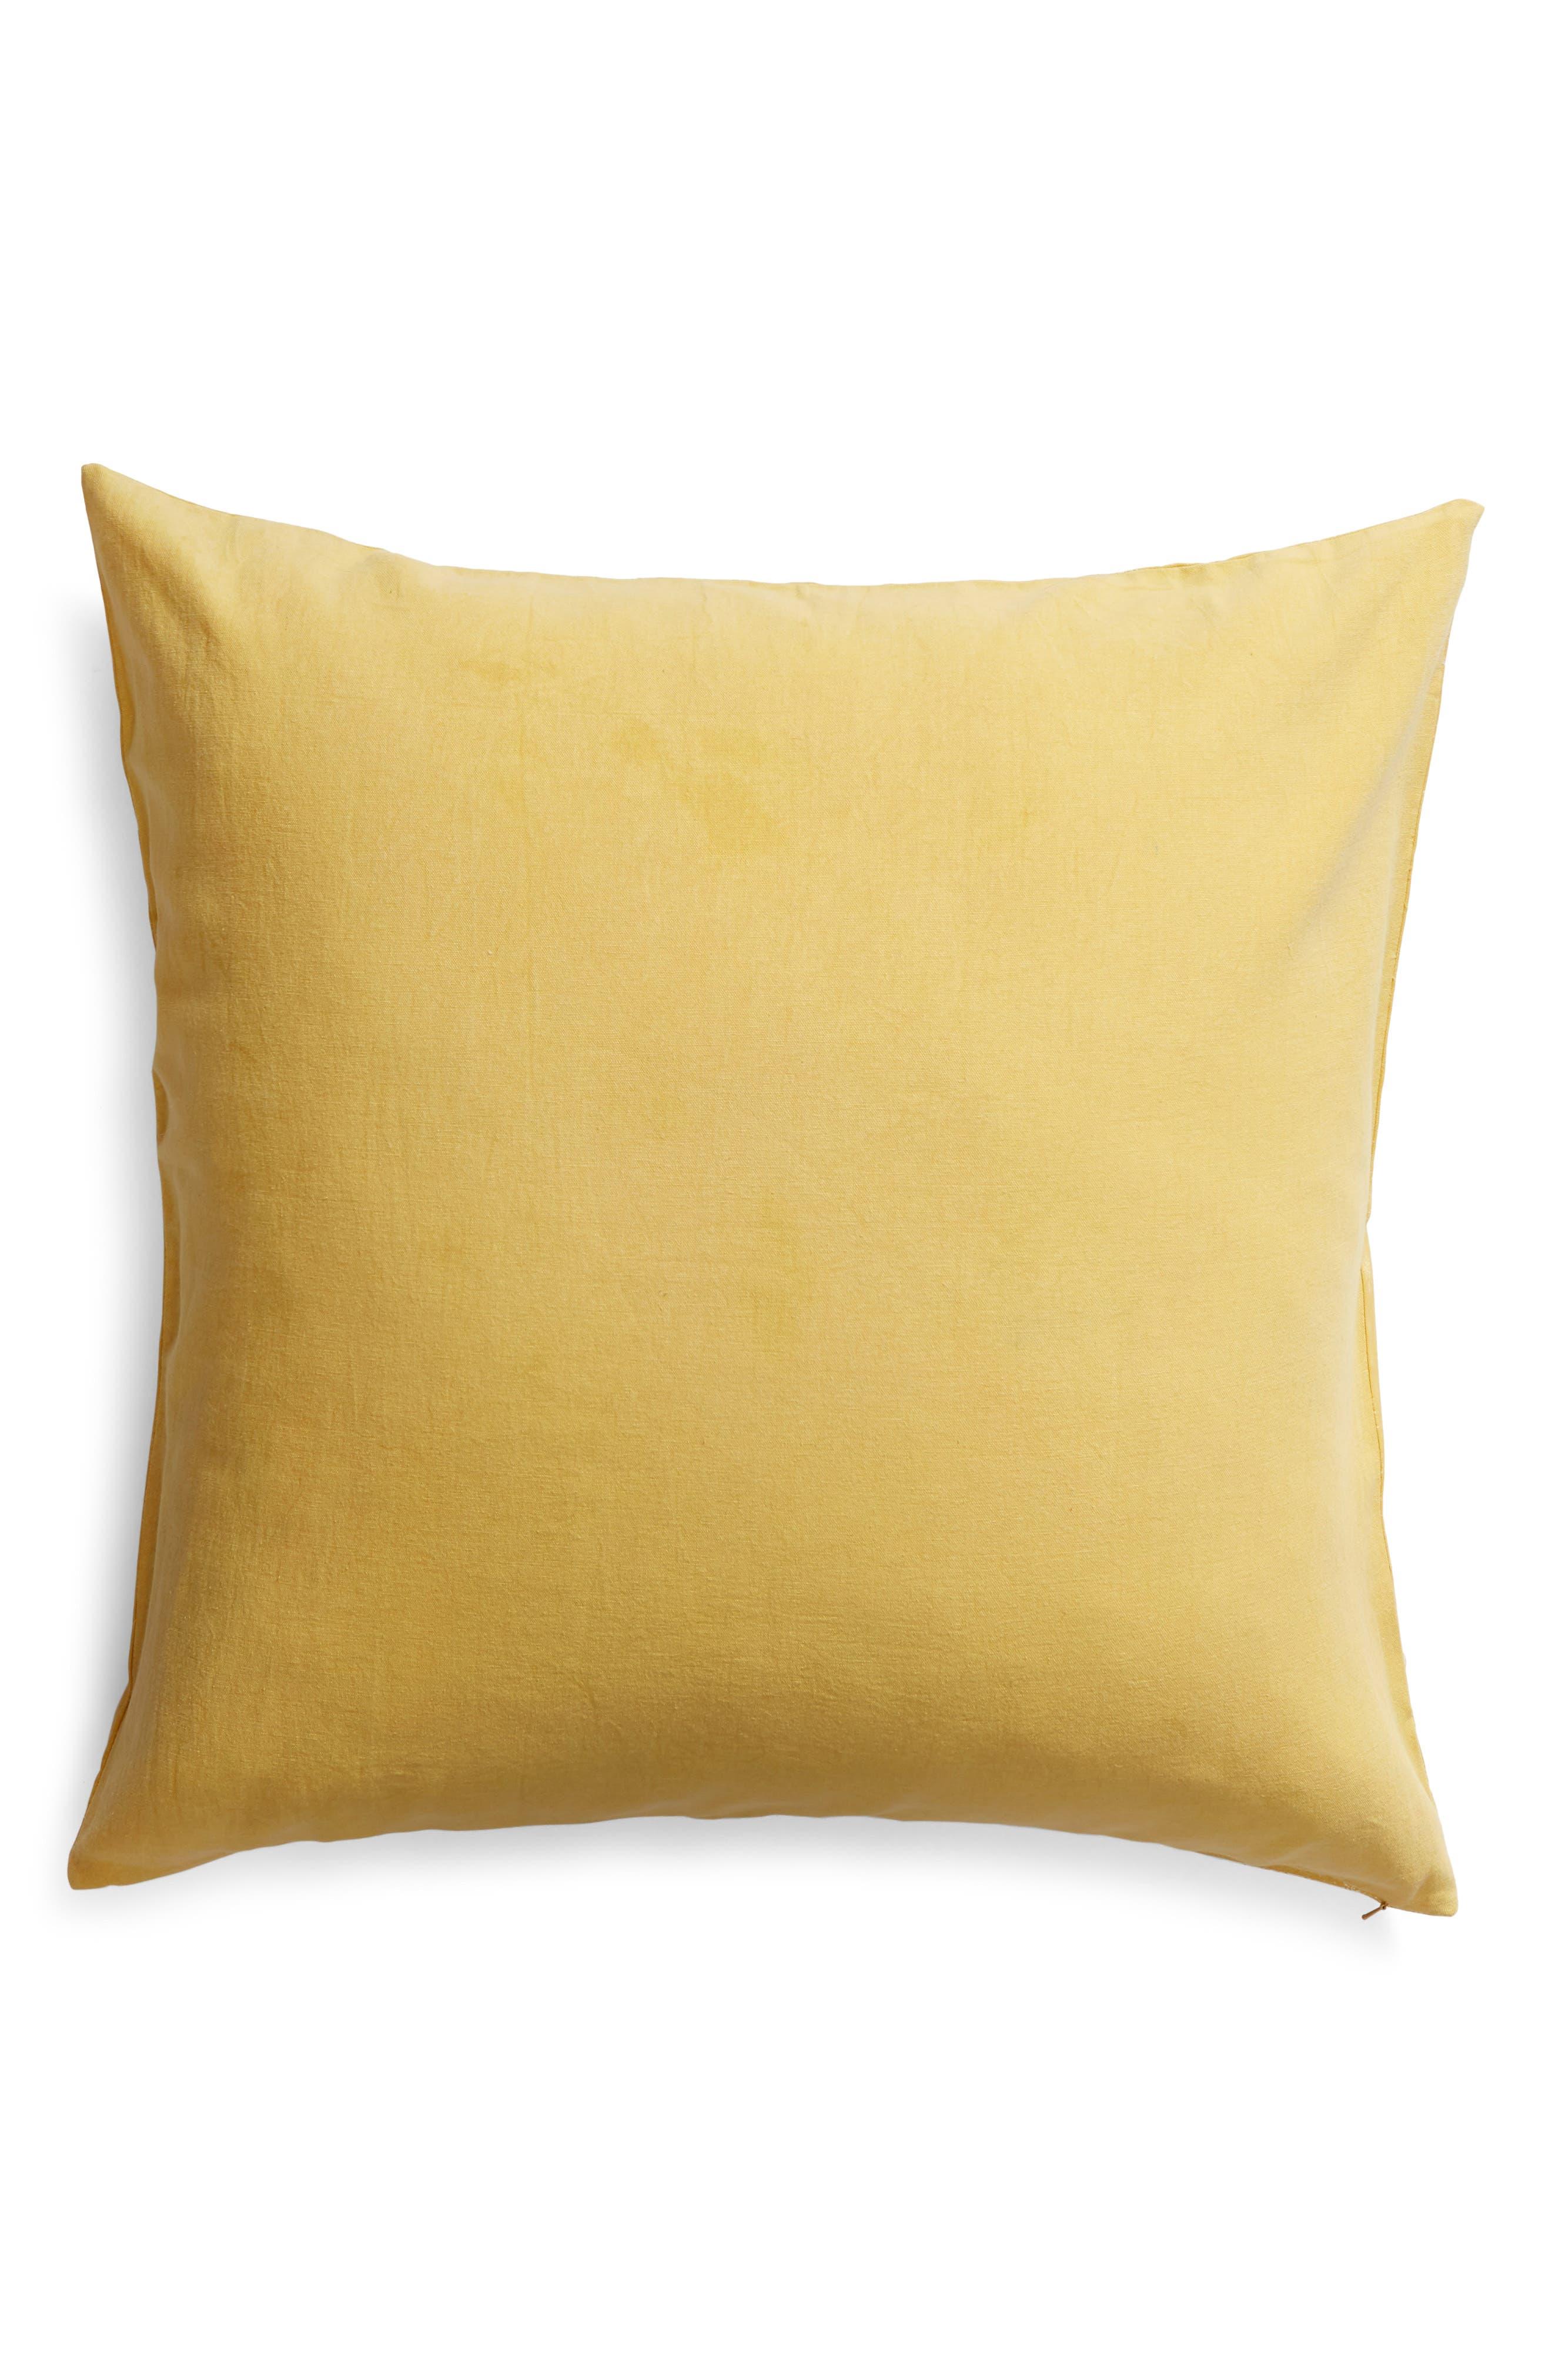 Hera Accent Pillow,                             Alternate thumbnail 2, color,                             700